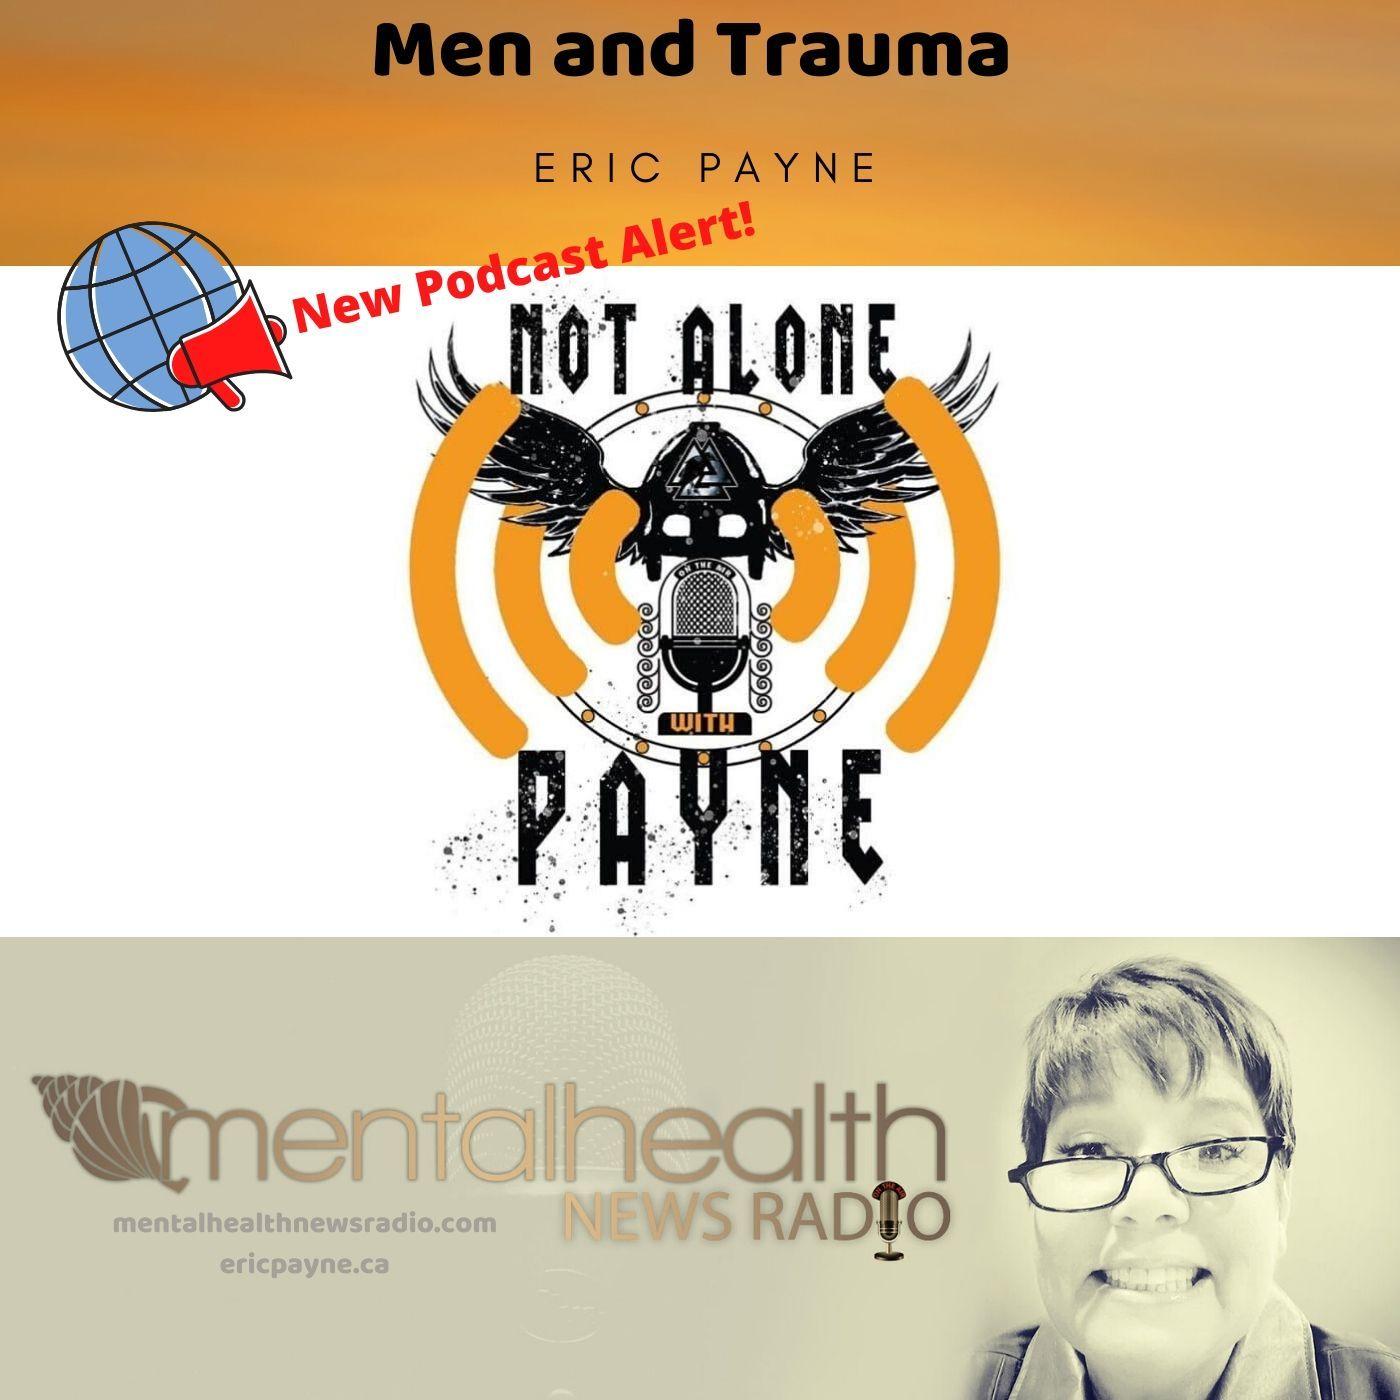 Mental Health News Radio - Men and Trauma: Not Alone with Payne